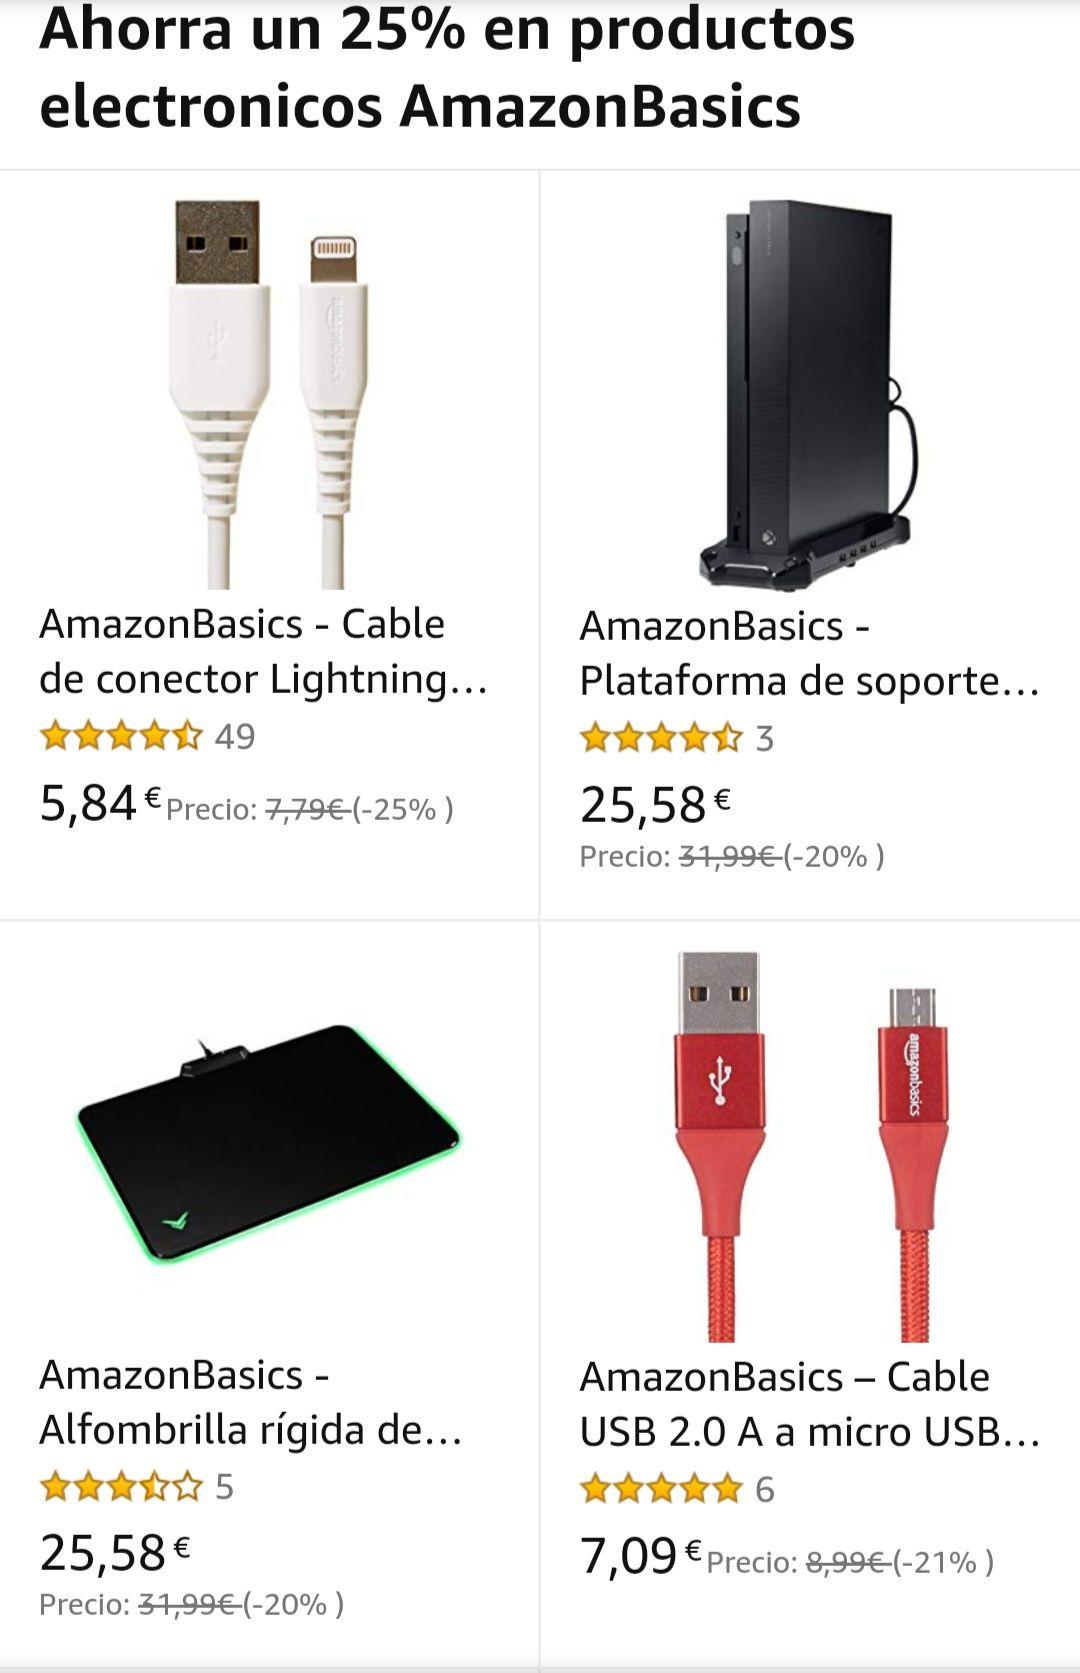 Productos Amazon Basics con un 20% de descuento